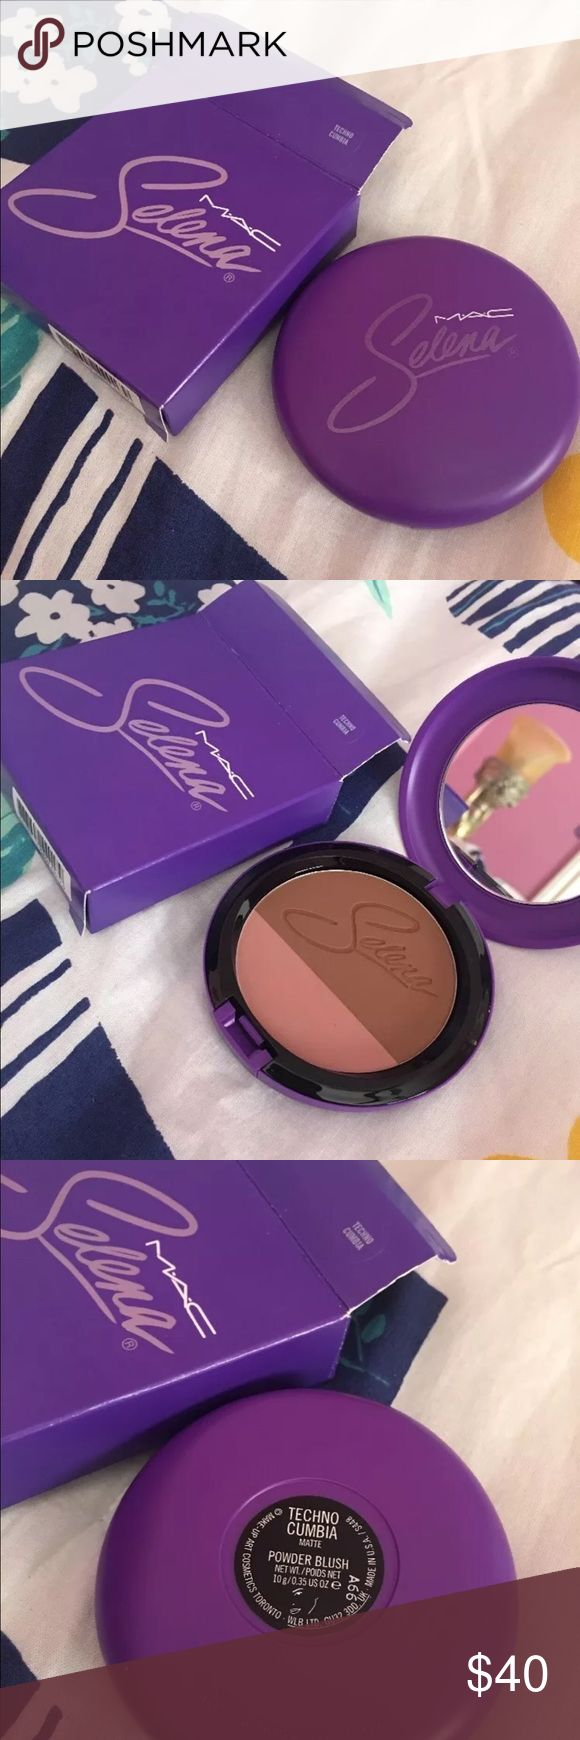 Selena Mac collection Techno cumbia powder blush MAC Cosmetics Makeup Blush